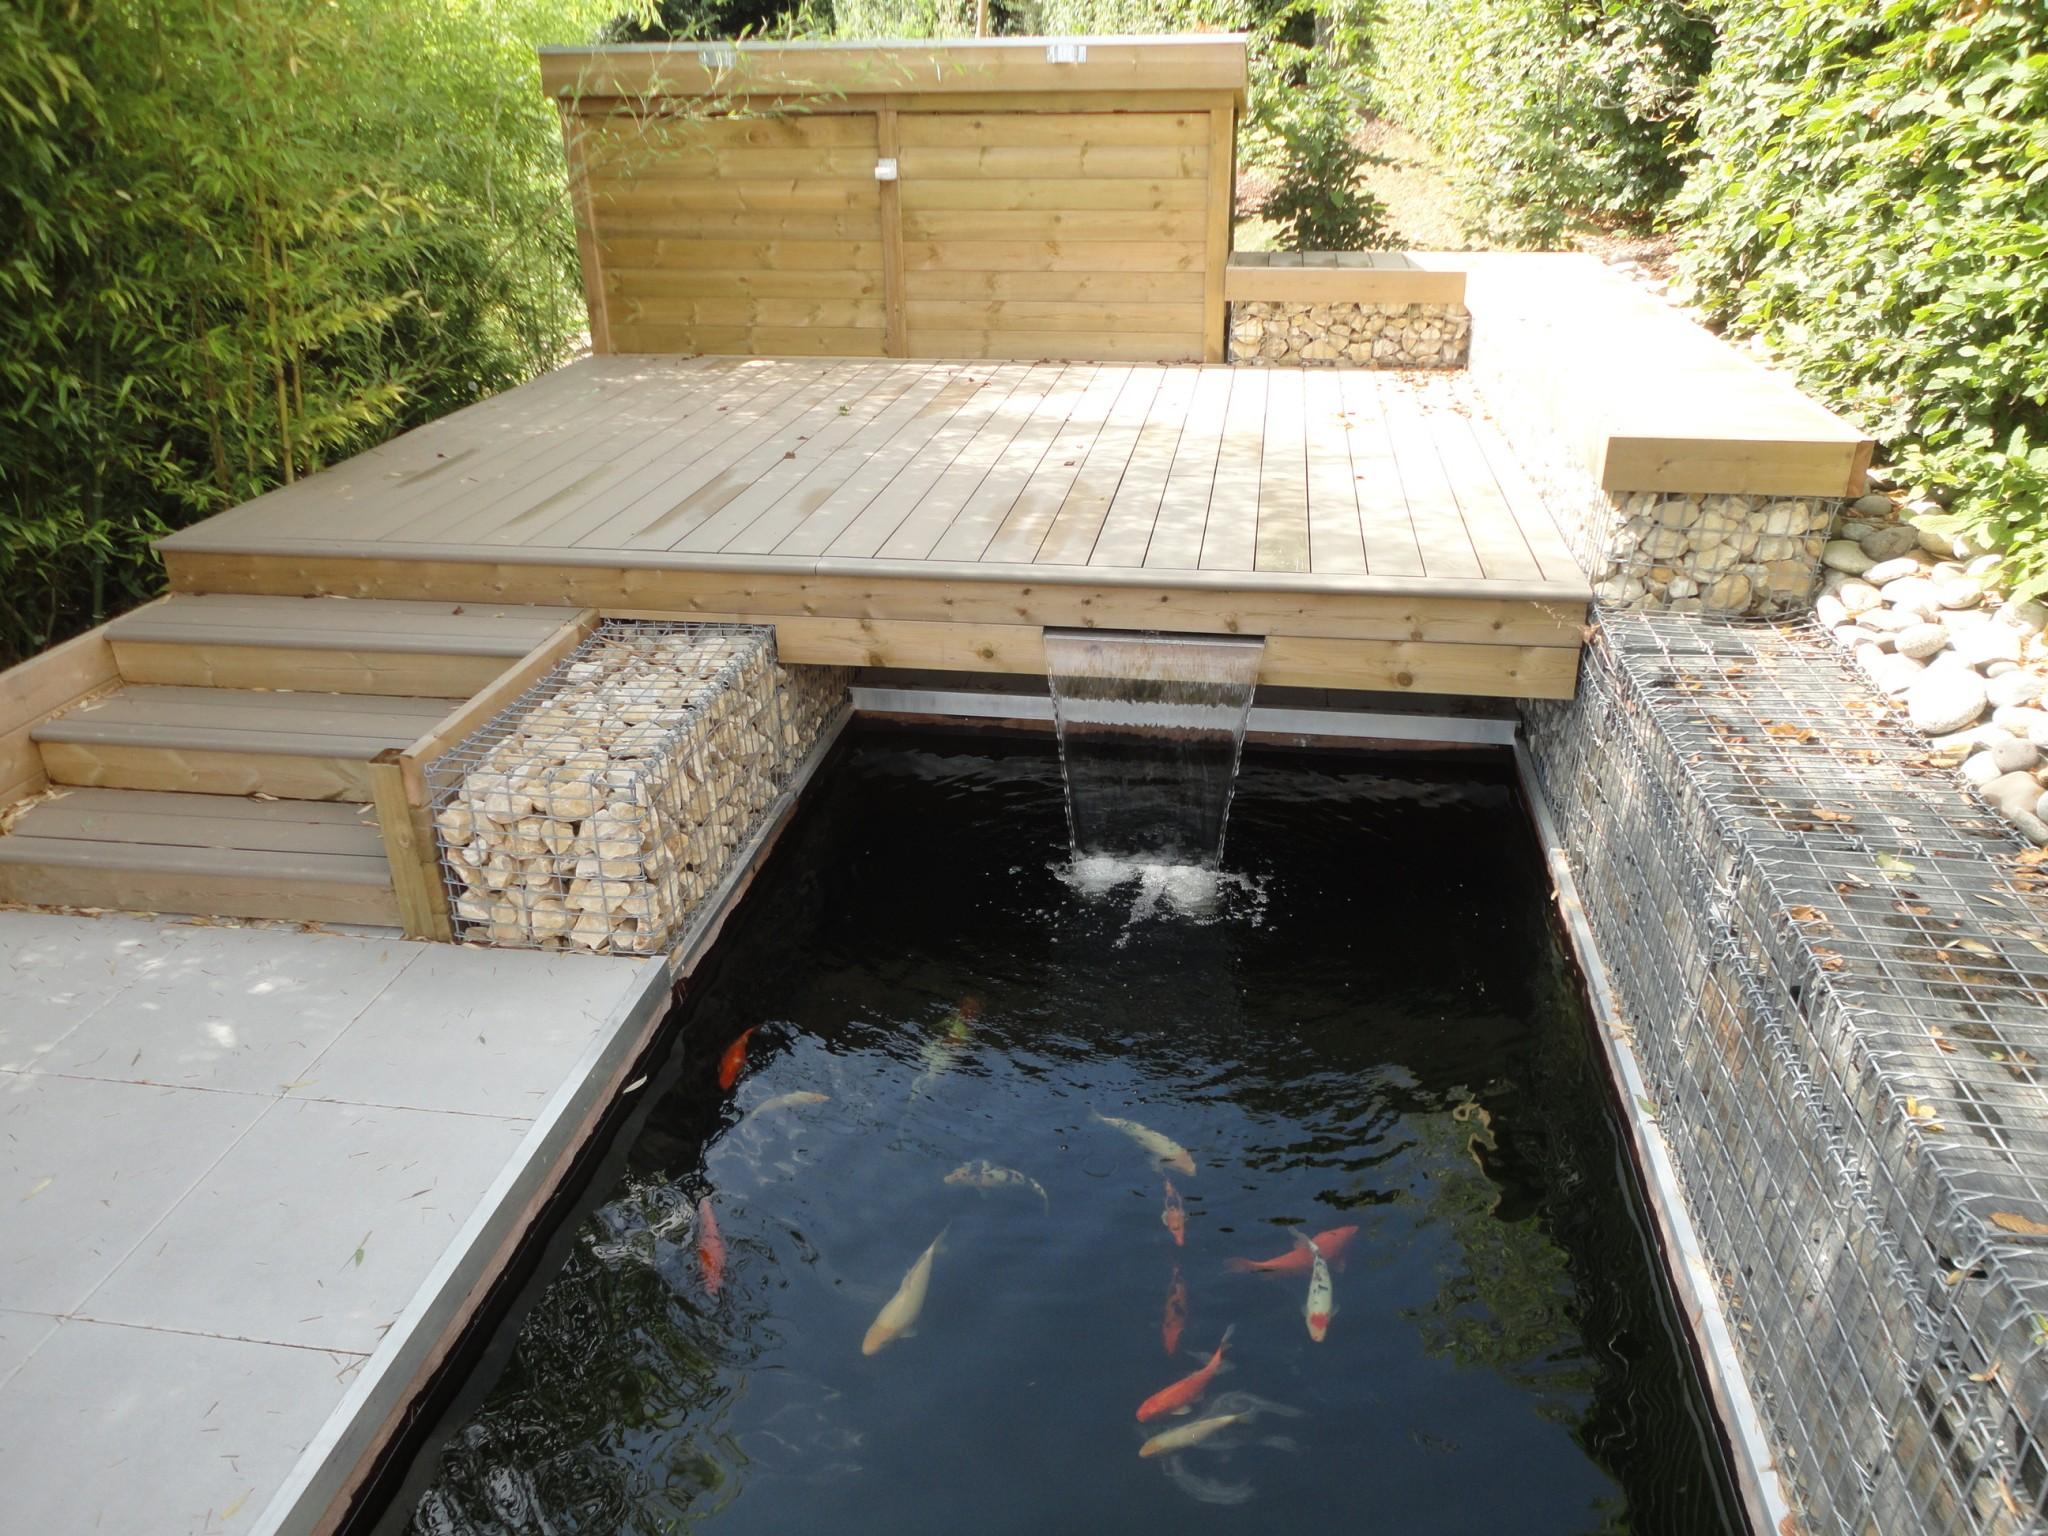 Notre jardin d 39 exposition permanente rebeyrol for Petit bassin de terrasse